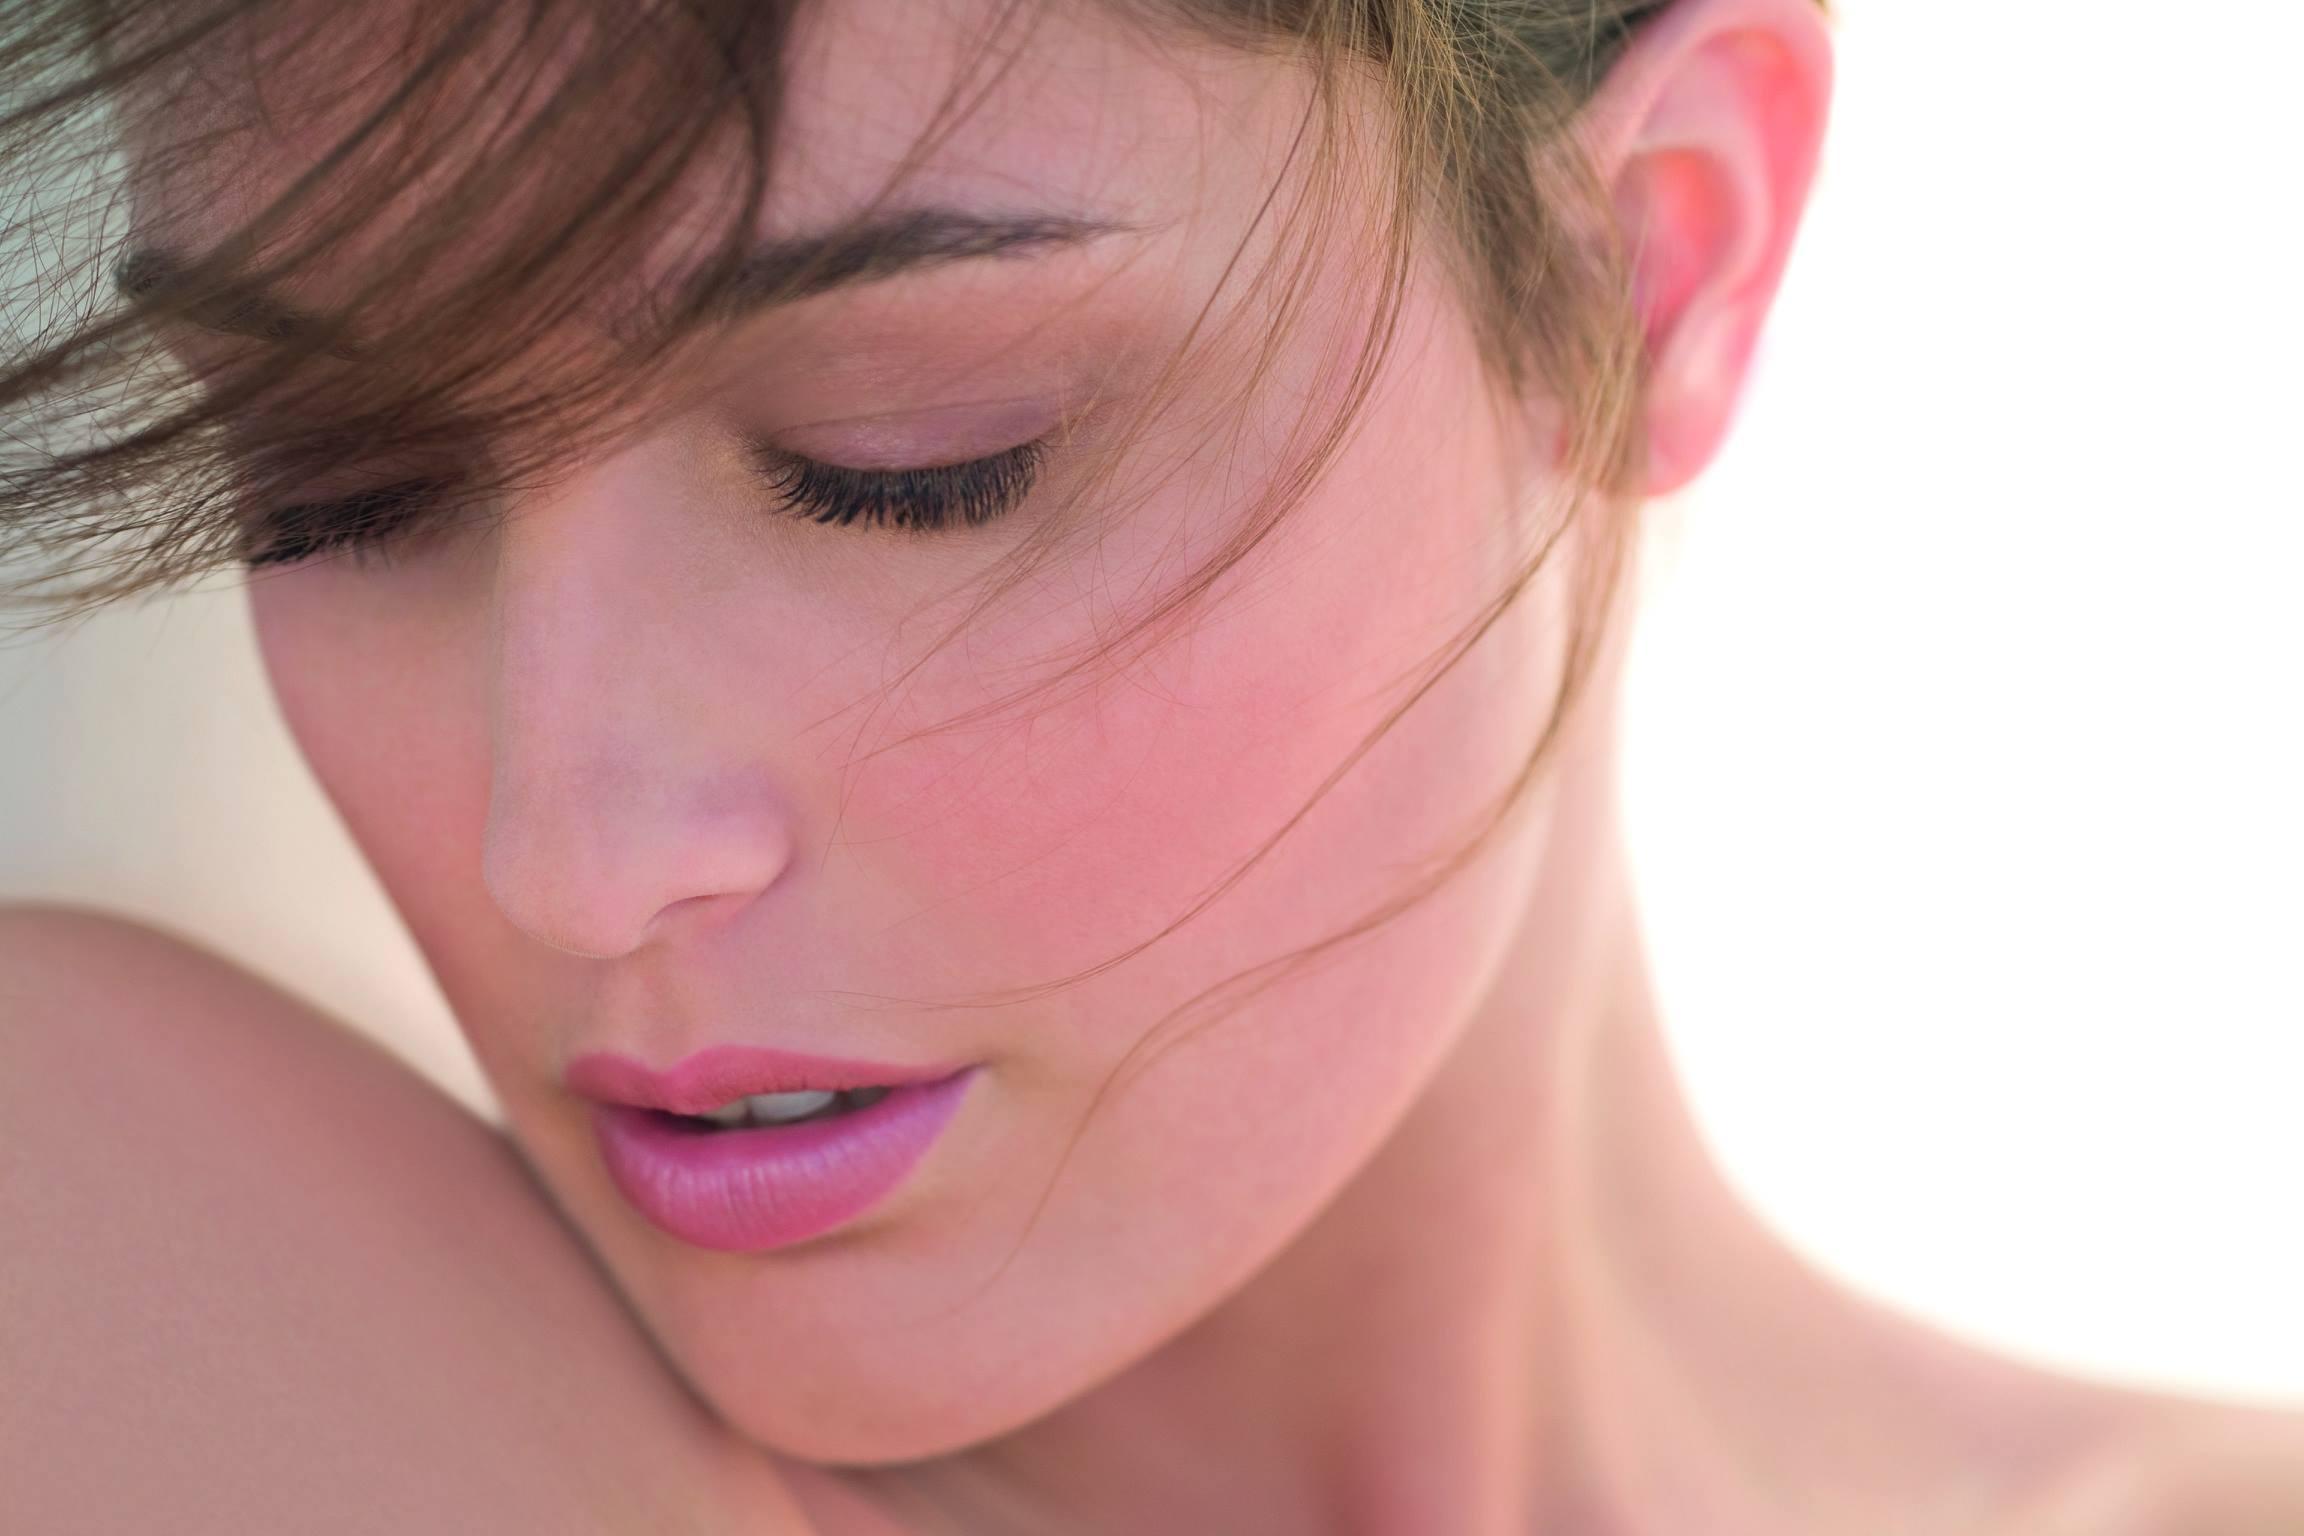 soin-visage-escapade-relaxante-aix-en-provence-massage-detente-thalion